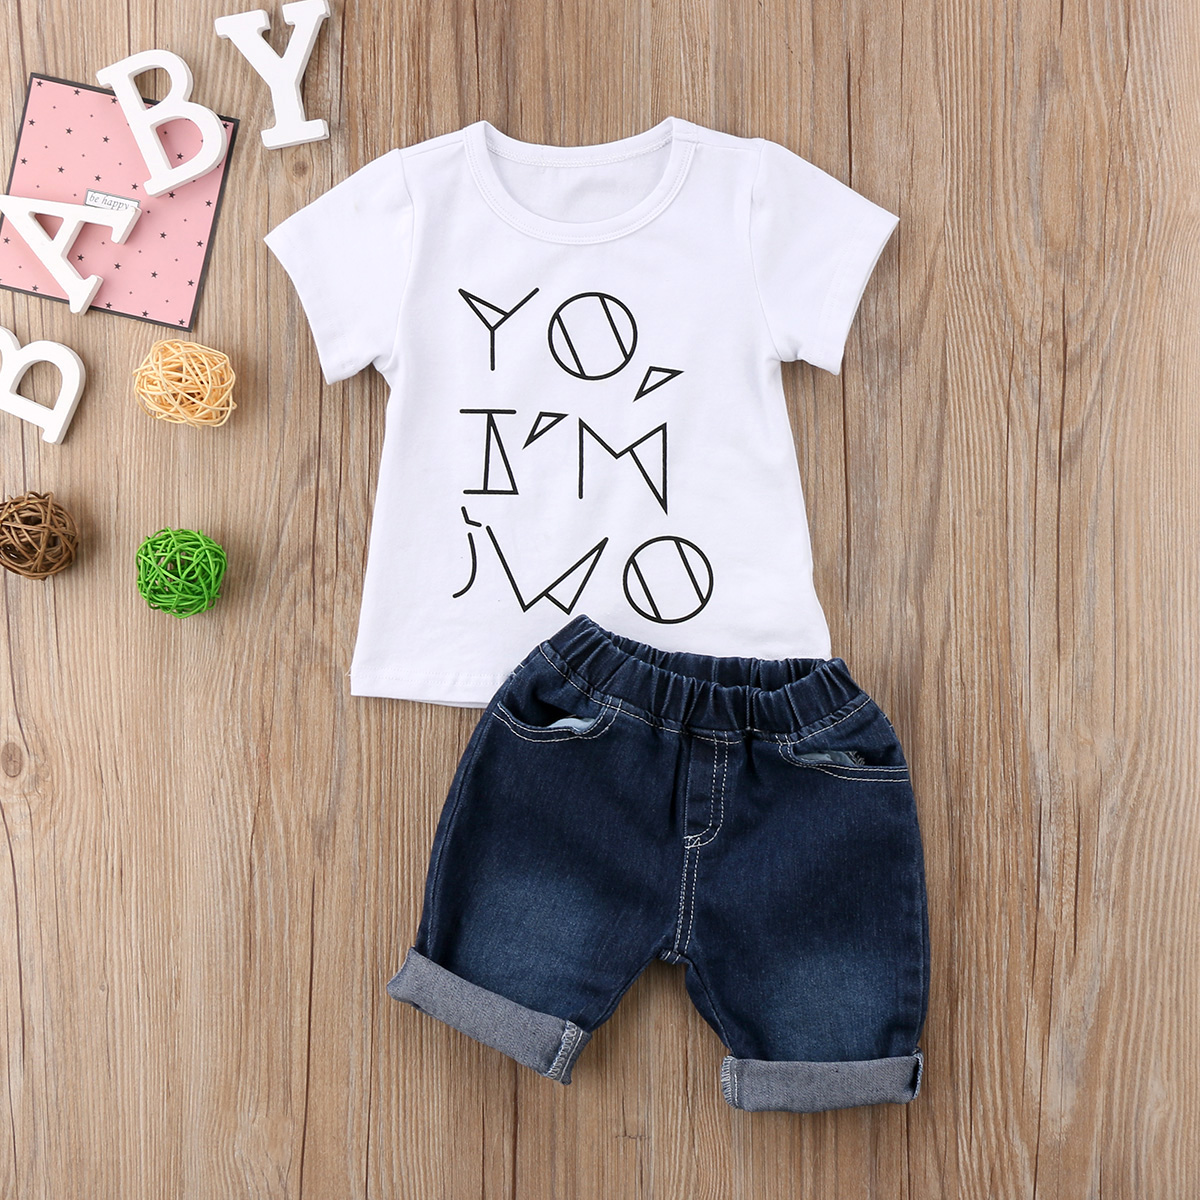 2PC Pudcoco Toddler Baby Boys White Color Cool Short Sleeve T-shirt+Denim Blue Pants Fashion Clothes Sets 6M-4Y